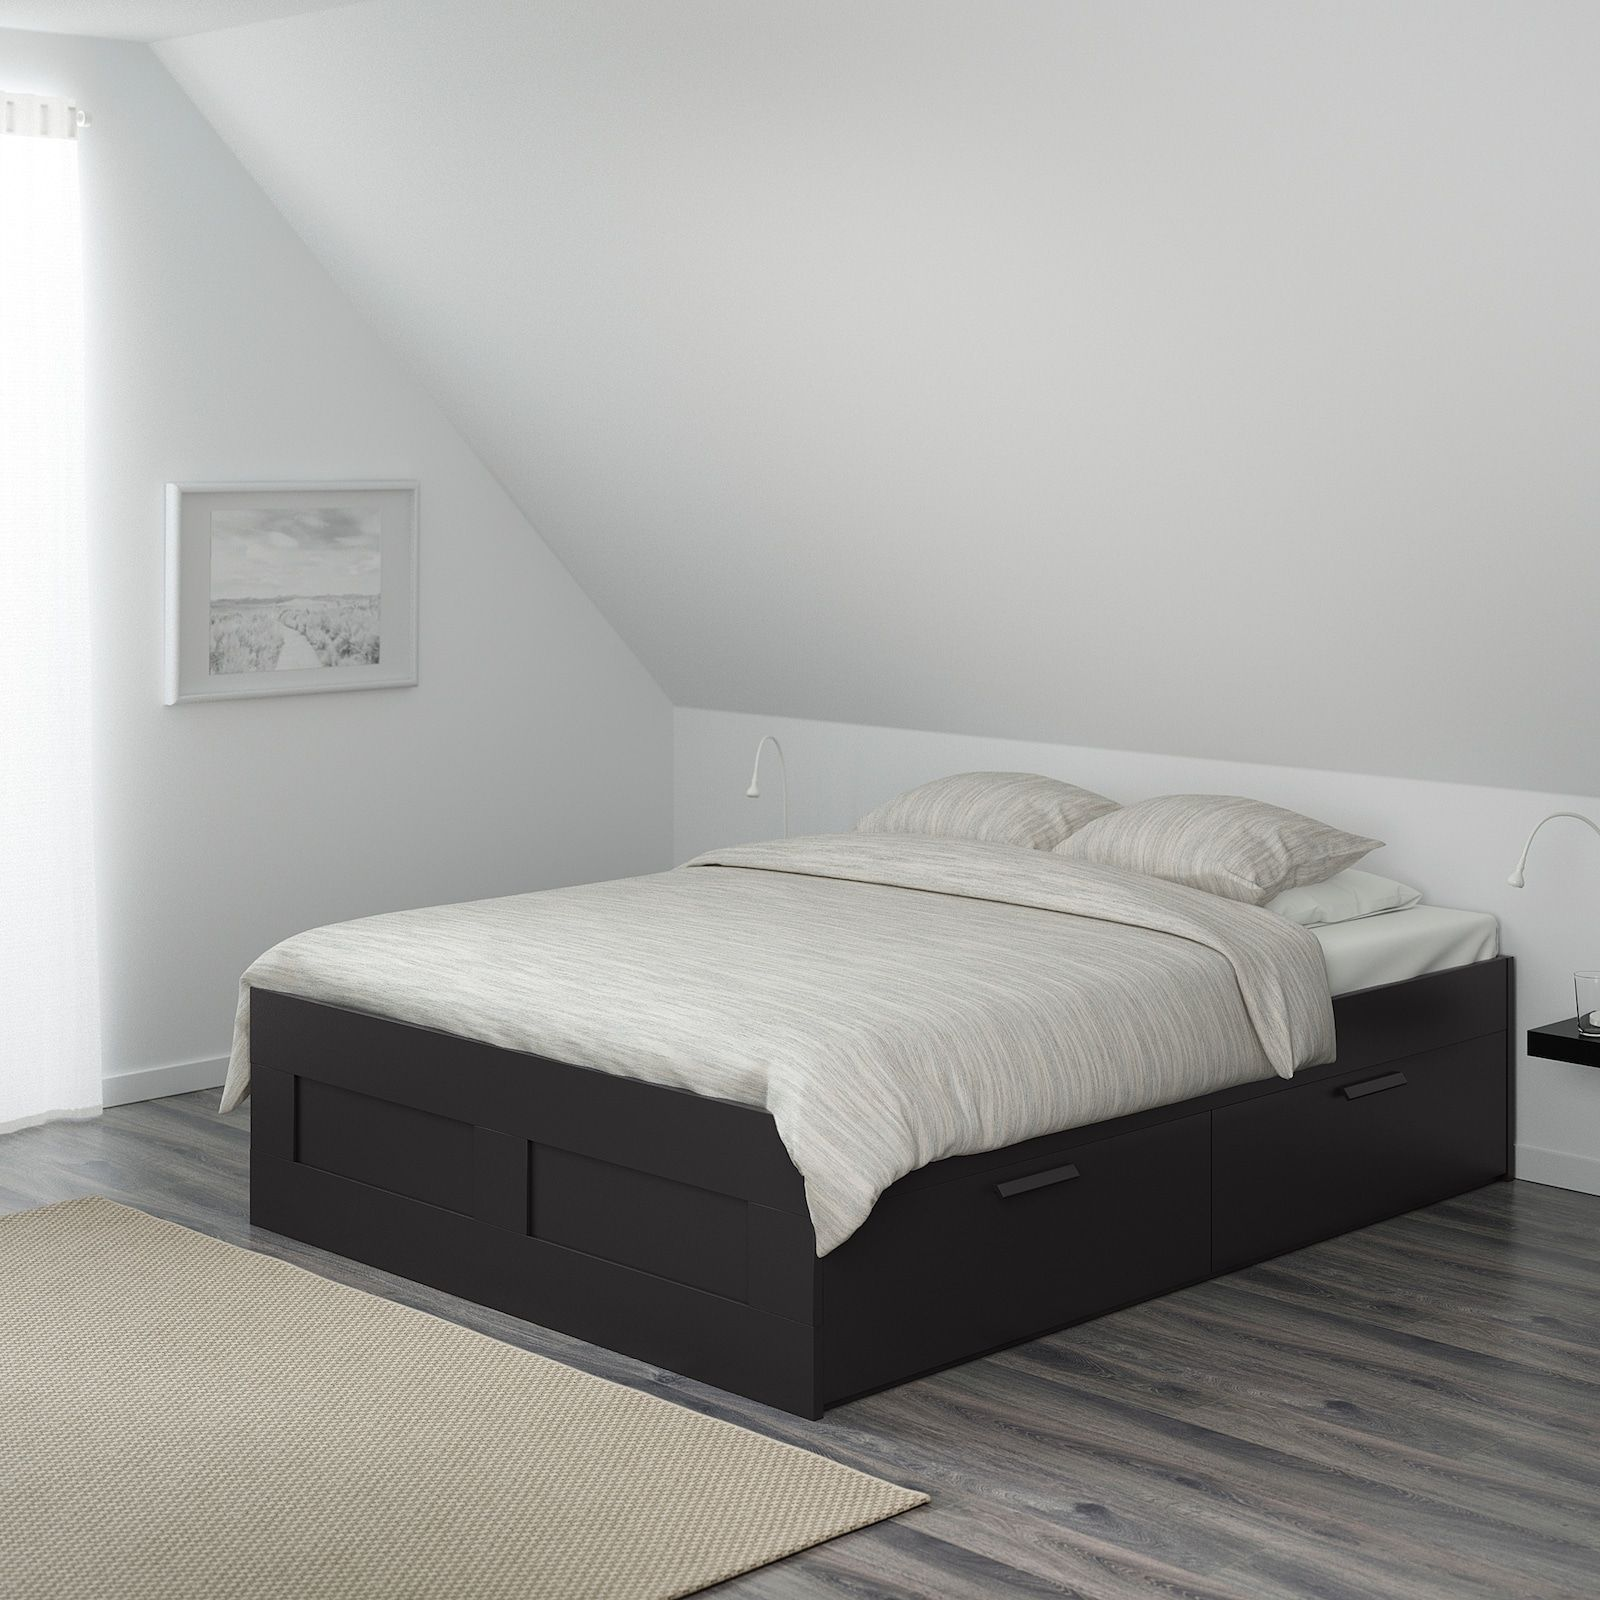 Brimnes Bed Frame With Storage Black Full Ikea In 2020 Bed Frame With Storage Brimnes Bed Black Bed Frame